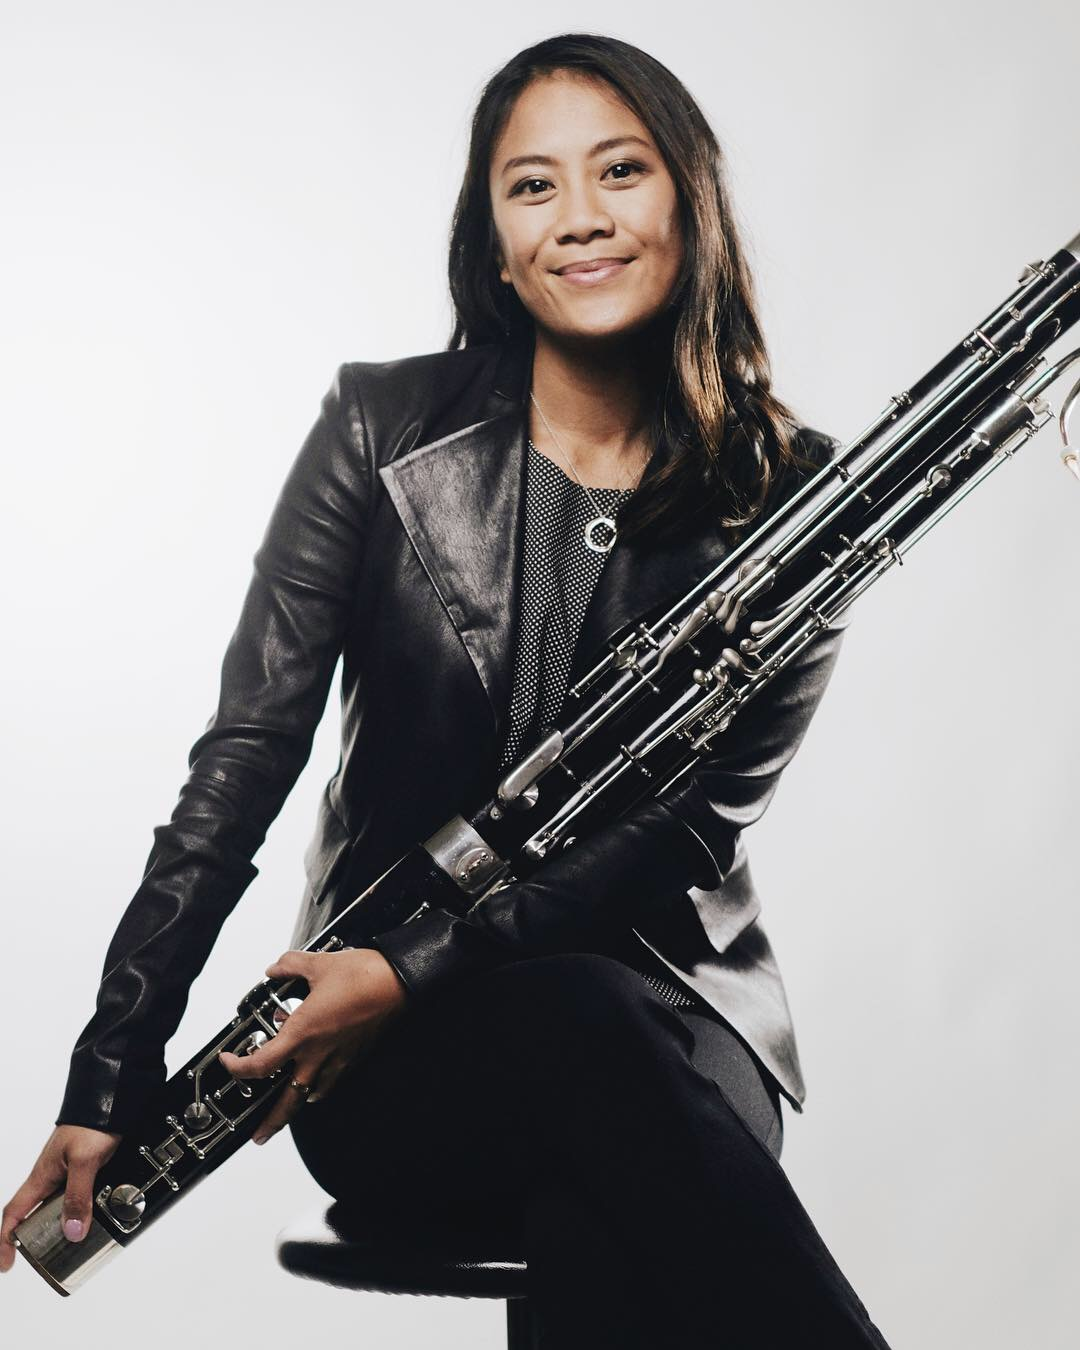 Marissa Olegario – Fred Fox School of Music